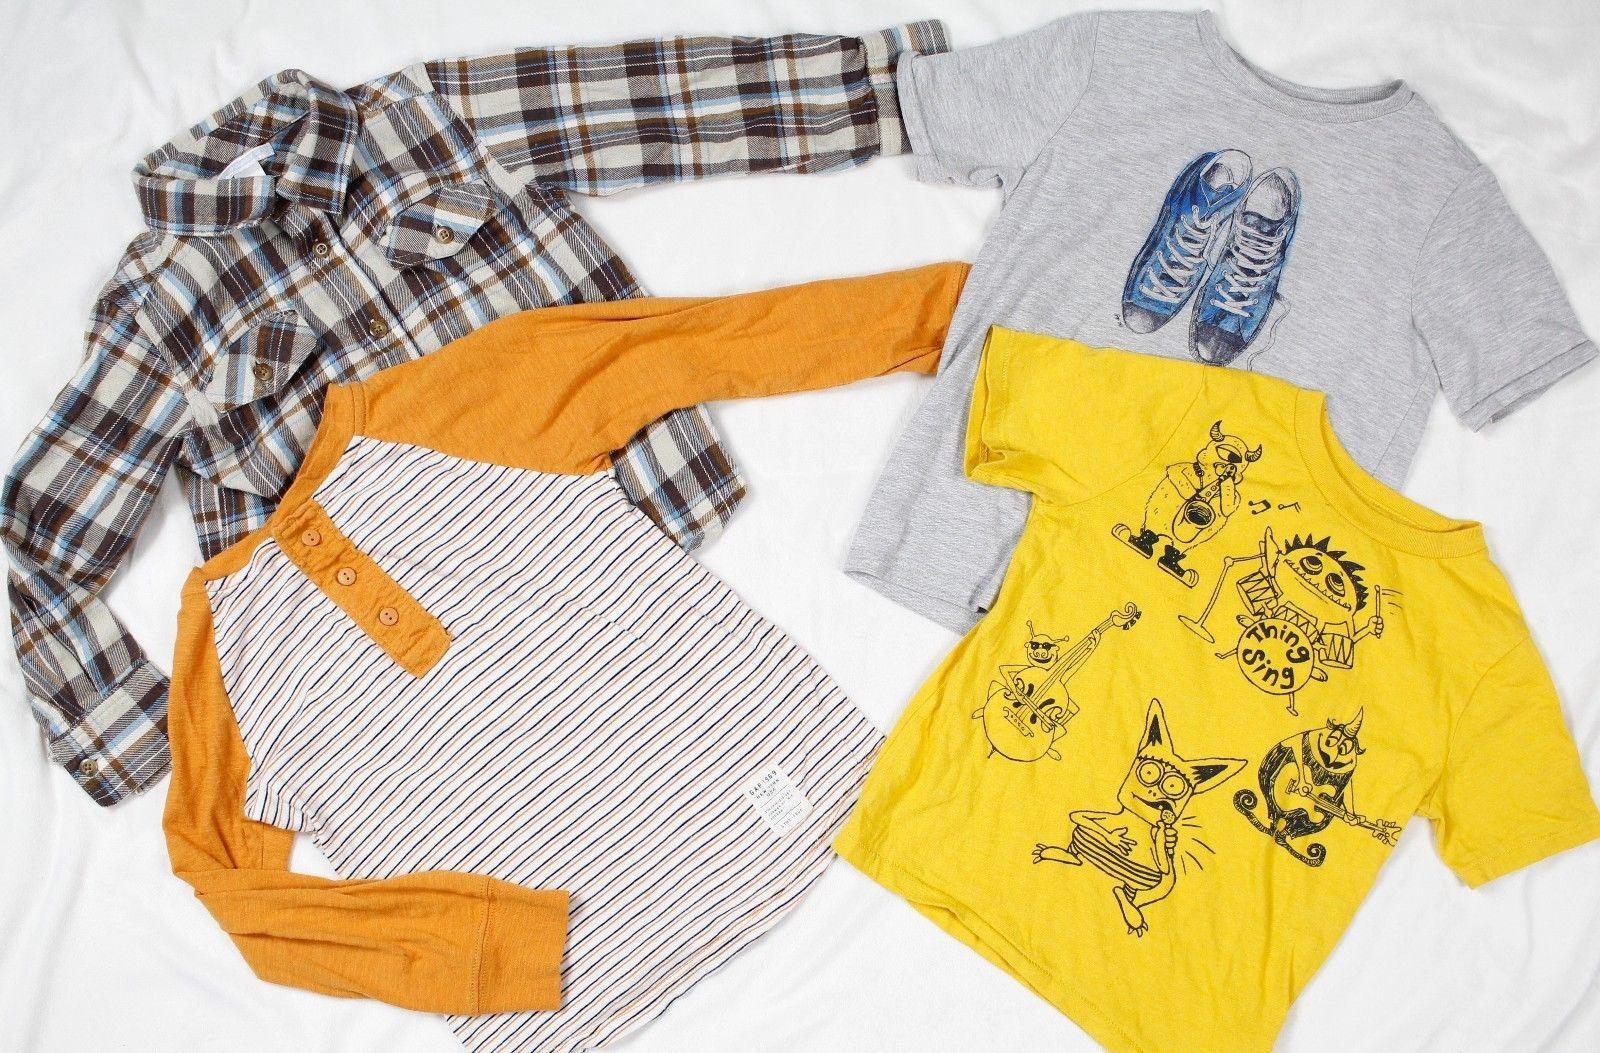 355e6db2f53298 Gap Kids   Old Navy T-Shirts Long Sleeve and 22 similar items